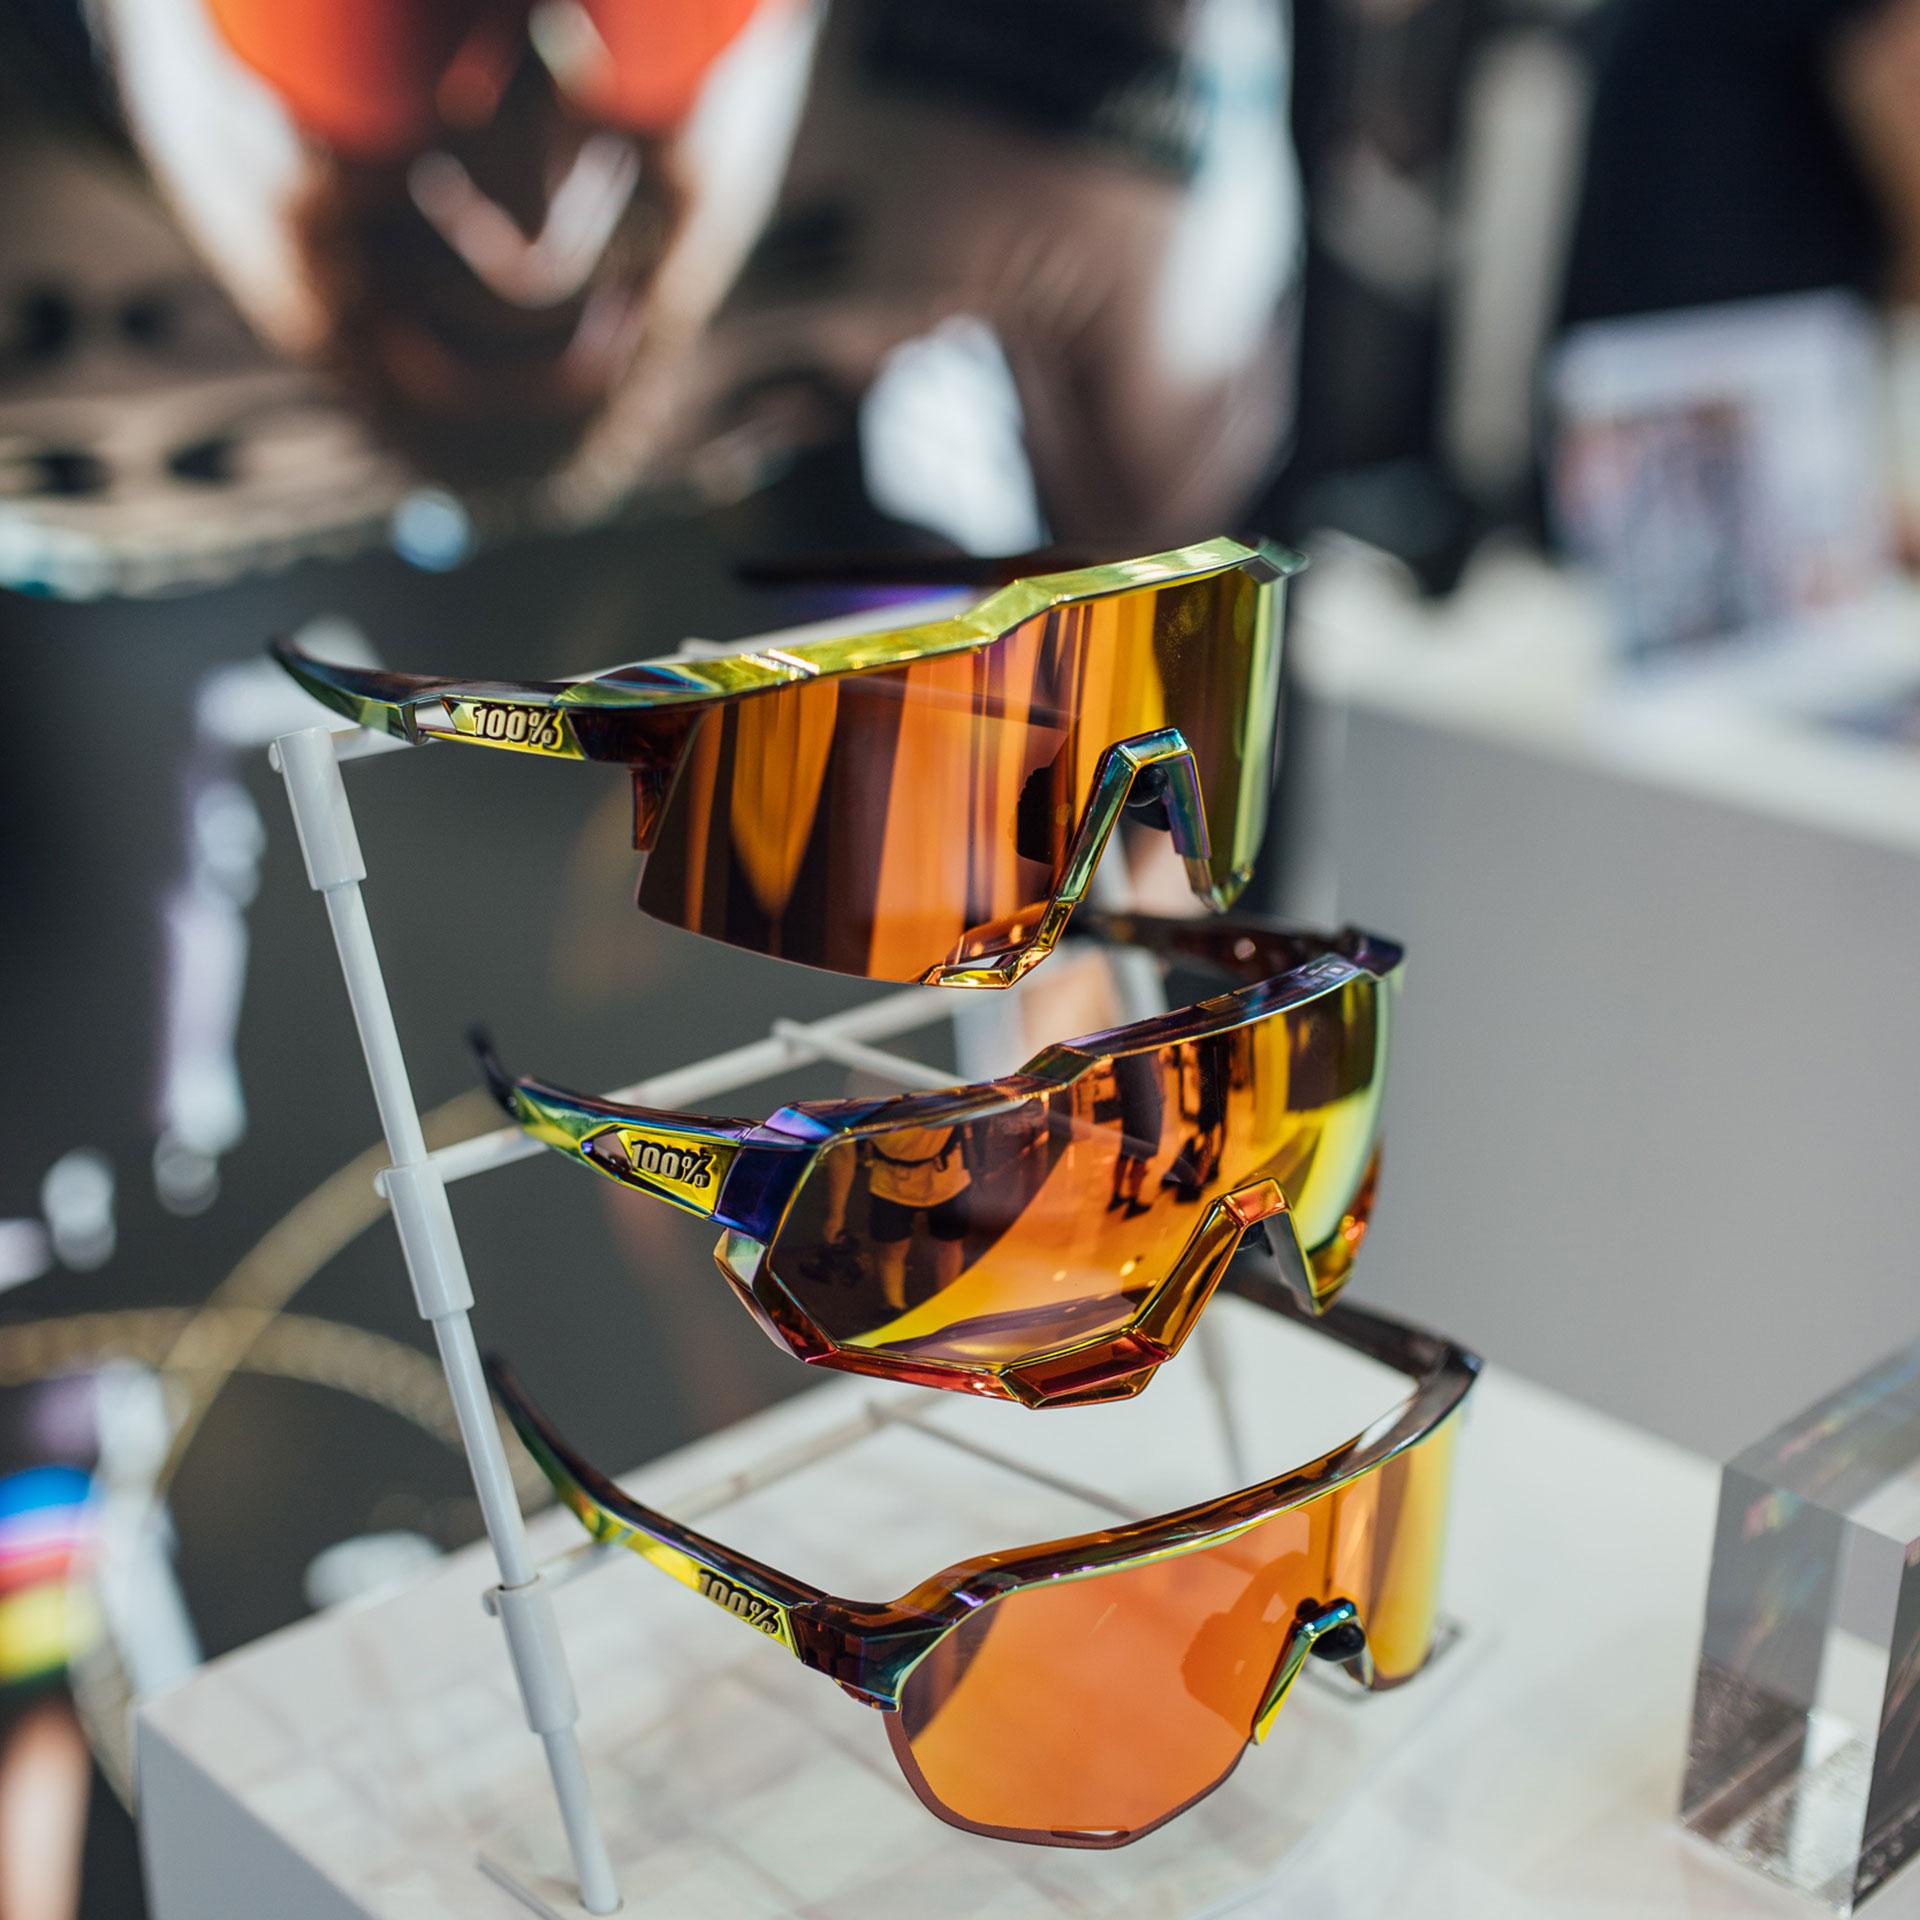 100% Sagan Limited Edition Sunglasses Range